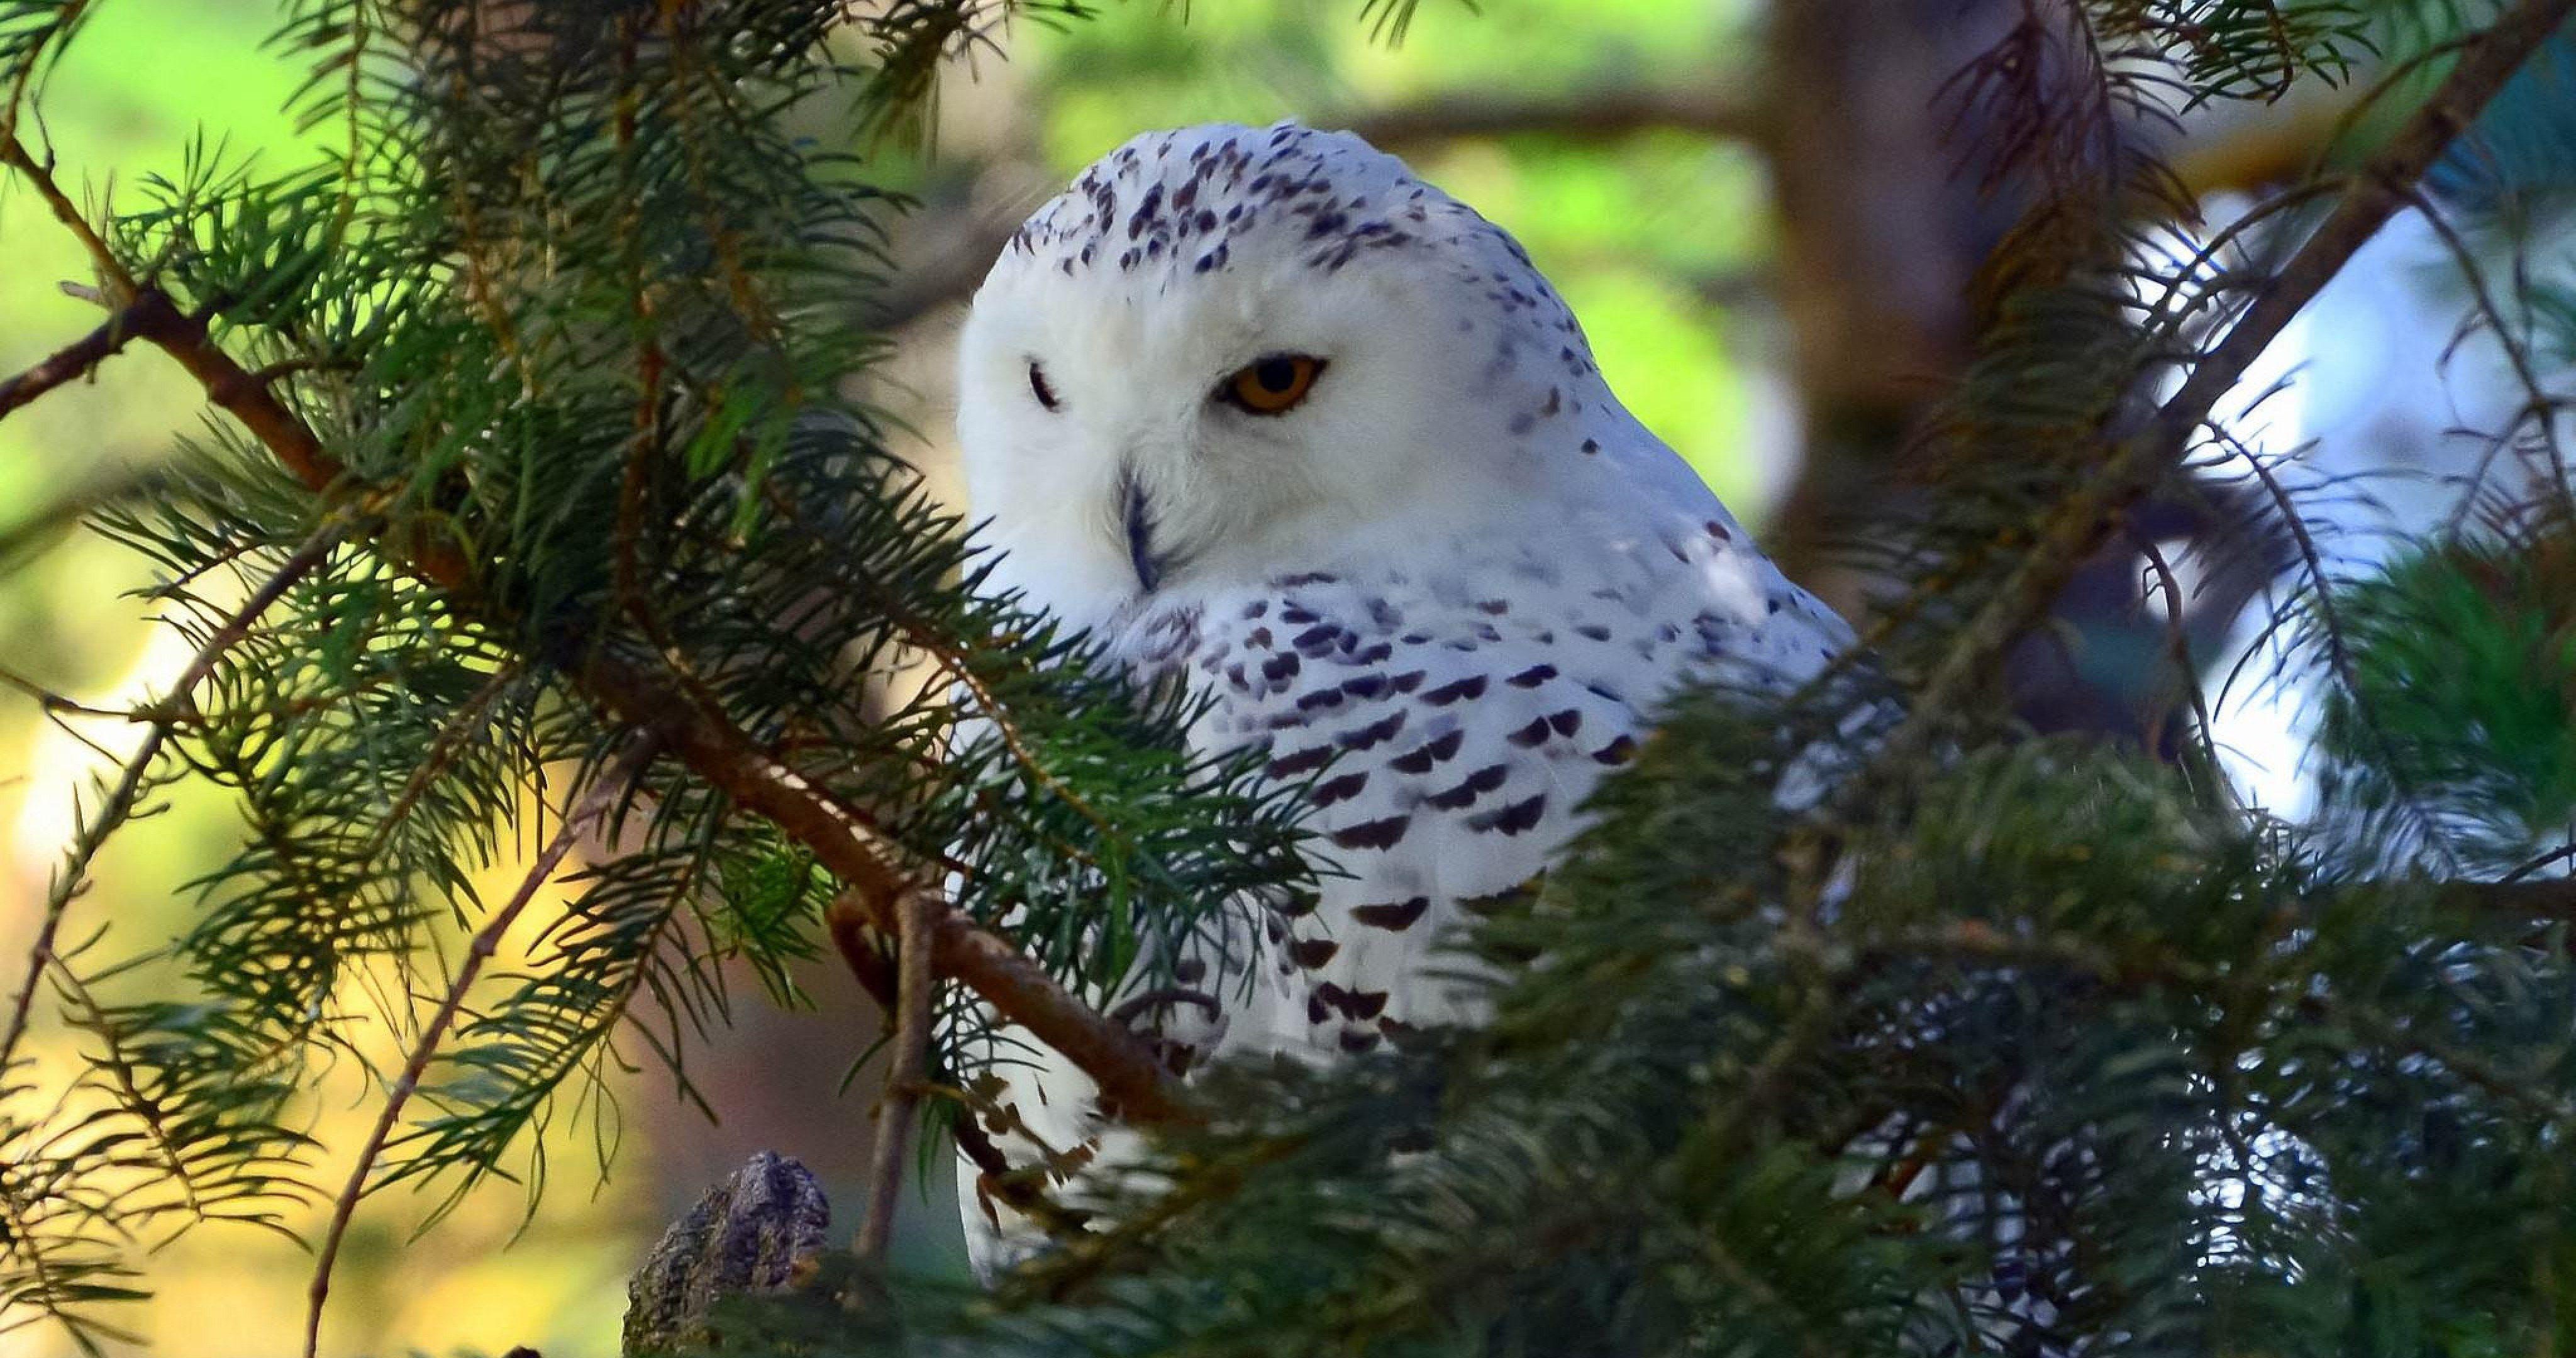 Polar Owl 4k Ultra Hd Wallpaper In 2019 Birds Wallpaper